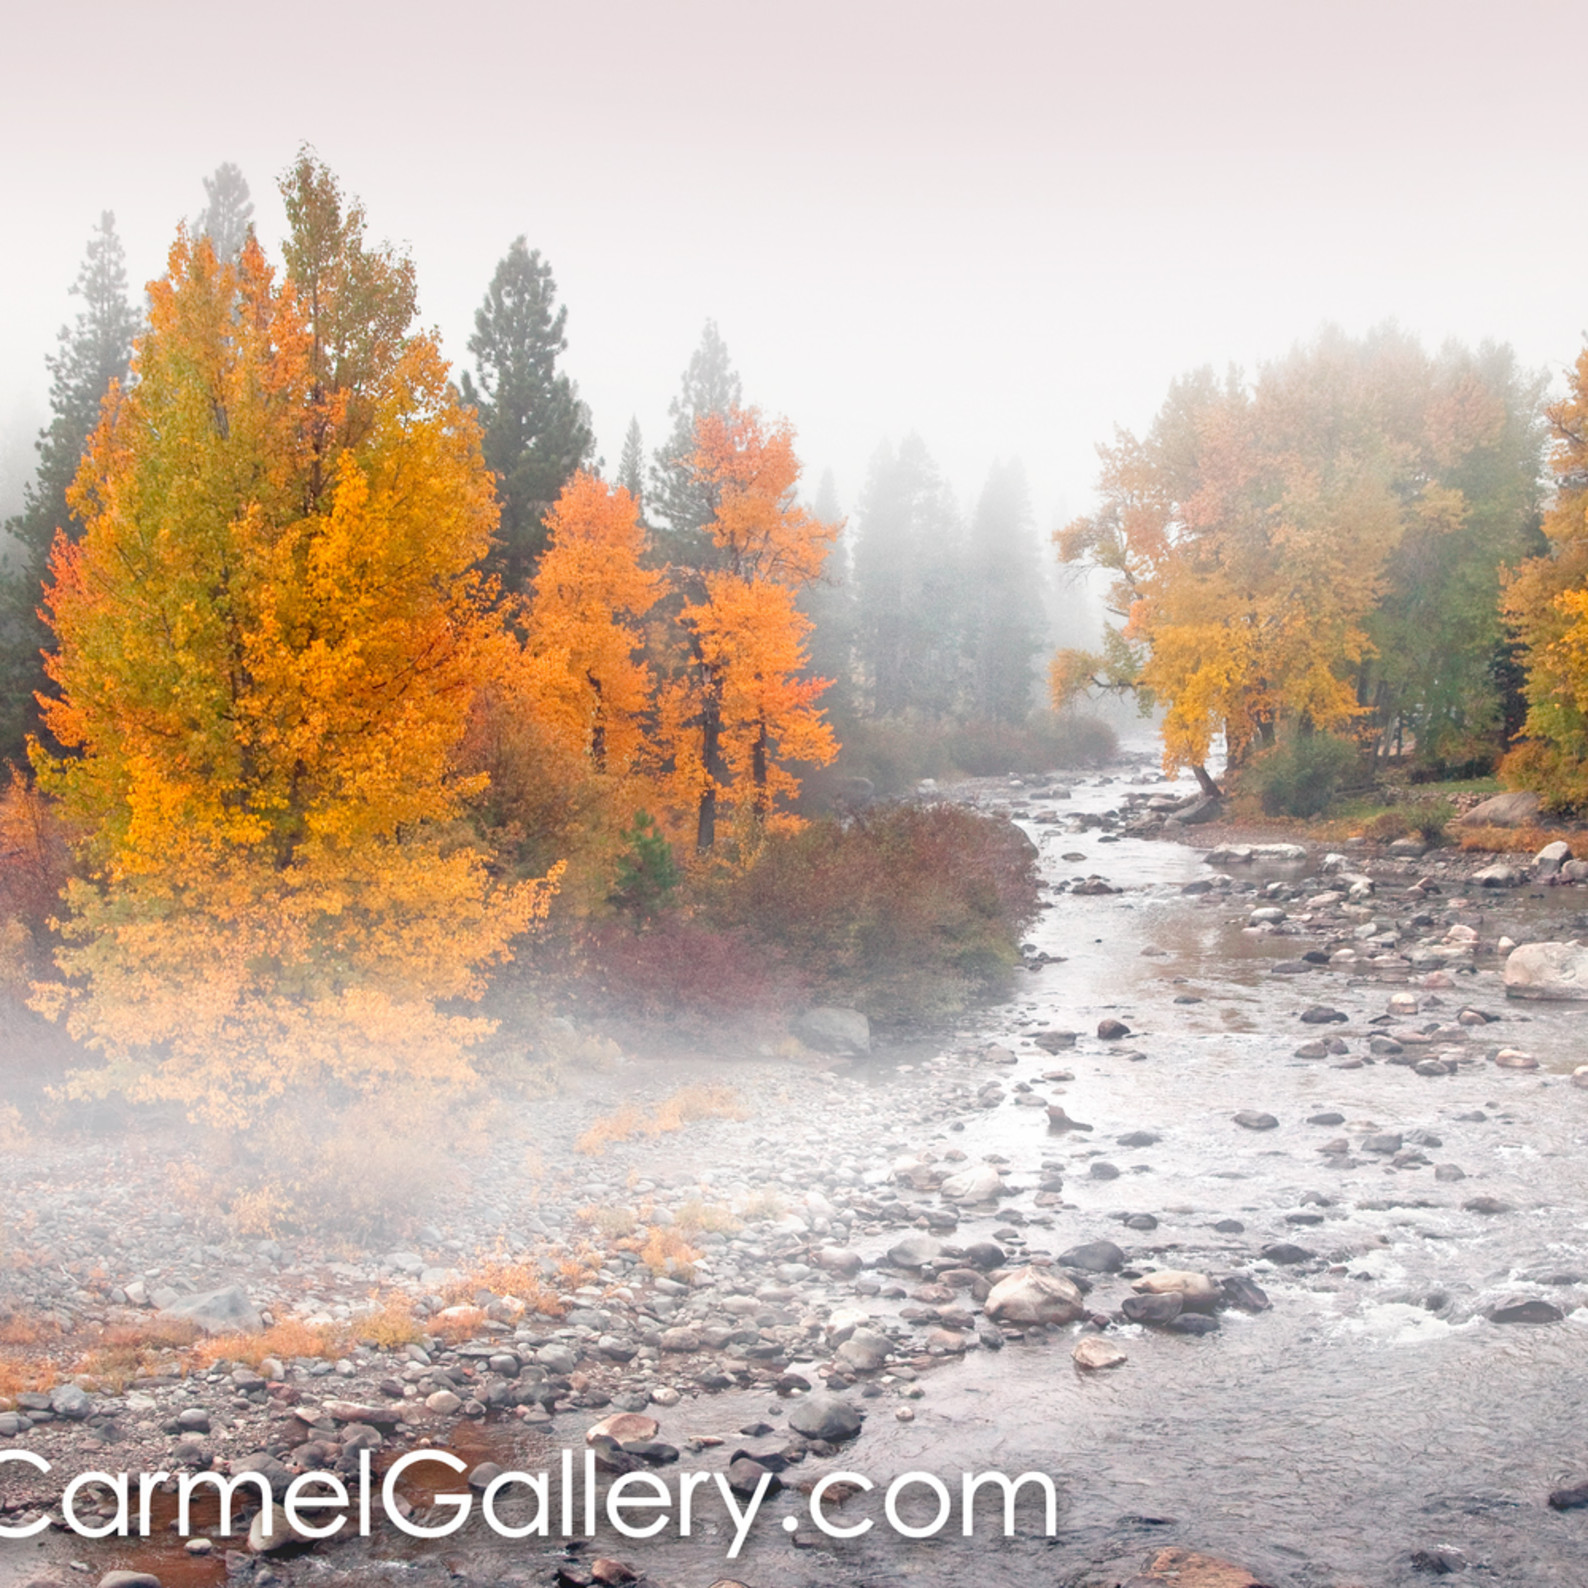 Autumn mist truckee river dtwikx